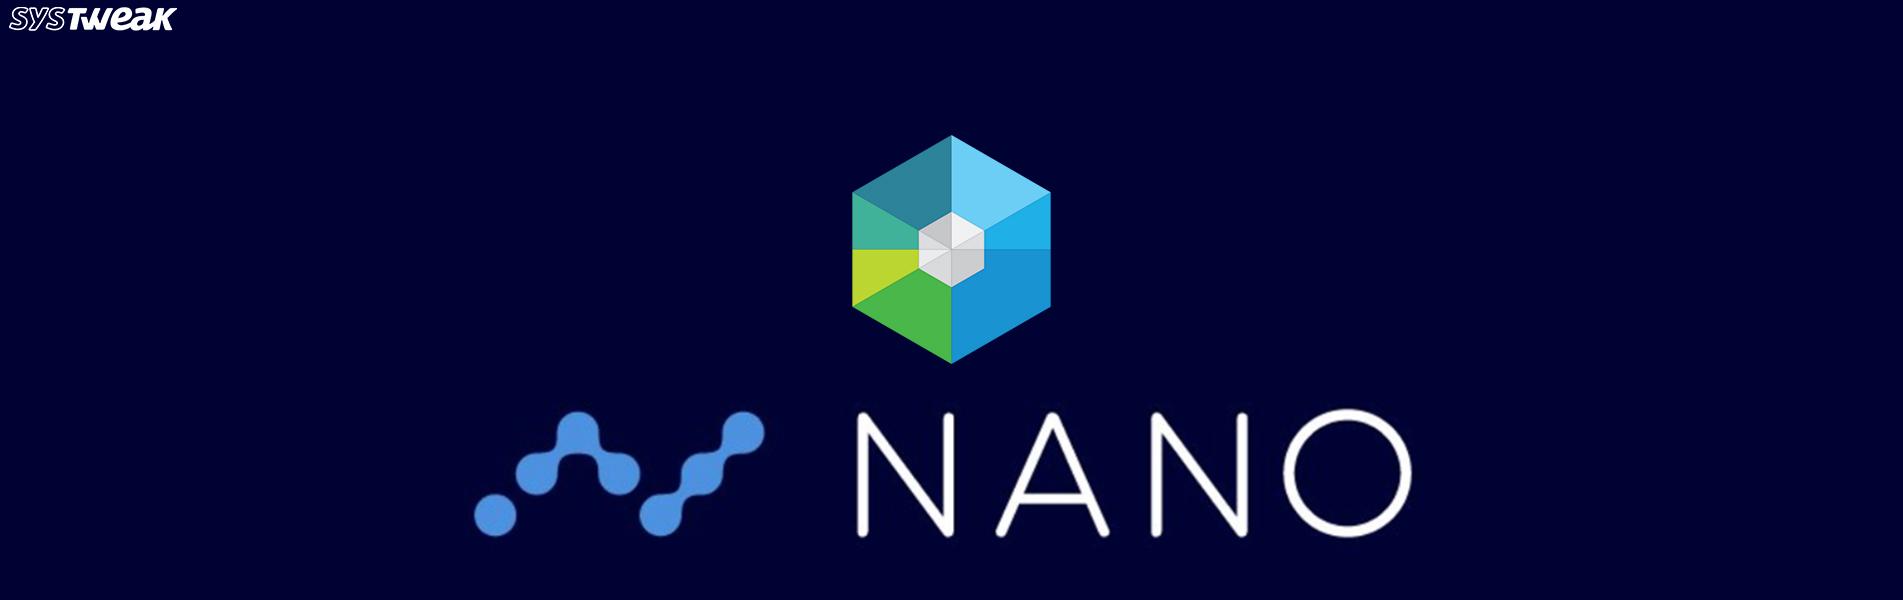 RAI Blocks Relaunches Itself as NANO